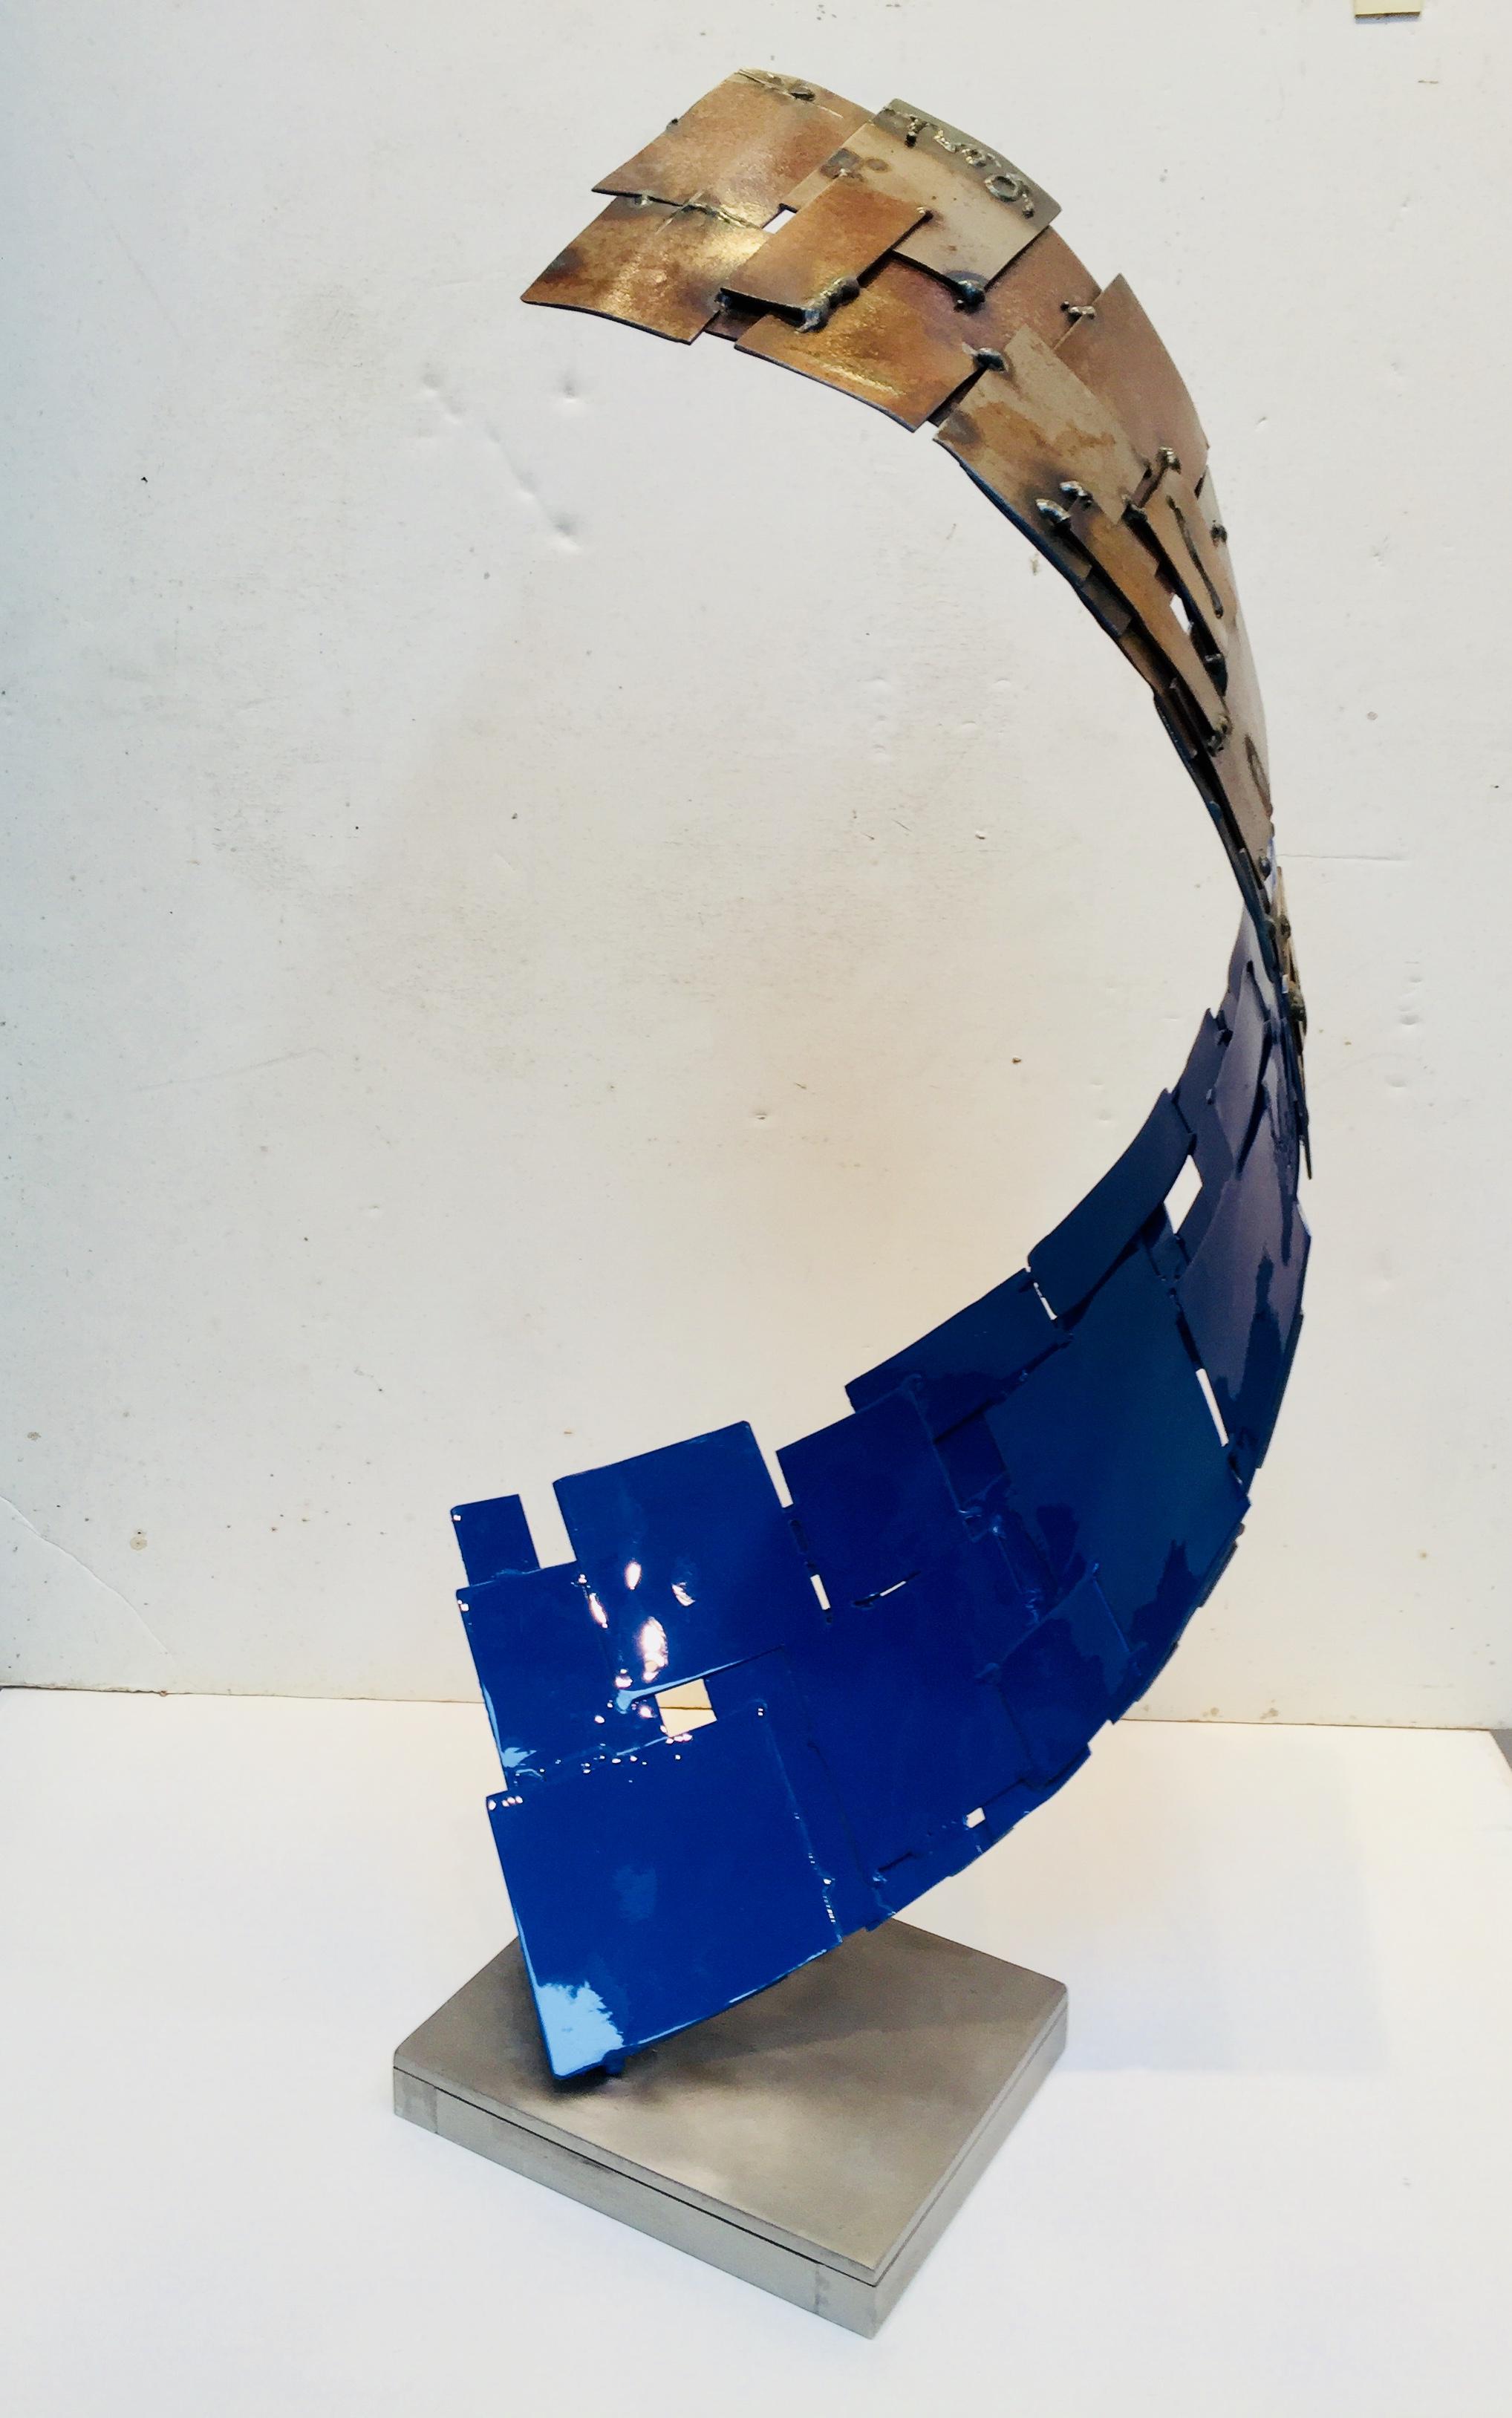 Blue Curl, 2018, painted welded steel, 24 x 12 x 13 in, $7,000